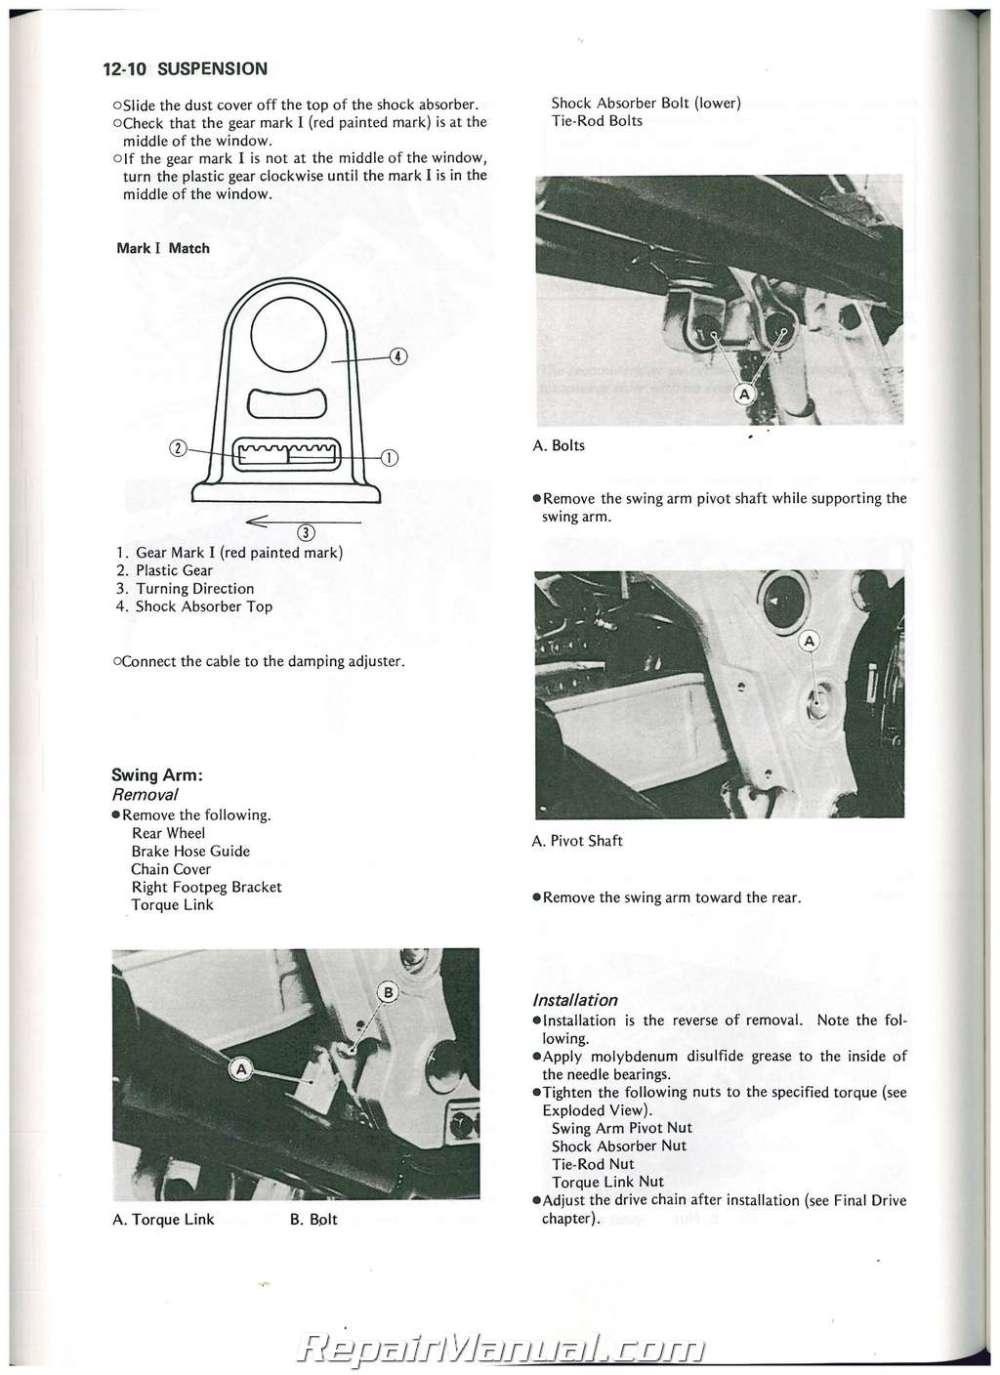 medium resolution of user motorcycle operating guides 11 abs ex300 2013 500r ex500 klf 1986 service manual for workshop repair kawasaki 1987 kawasaki 300 owners manual